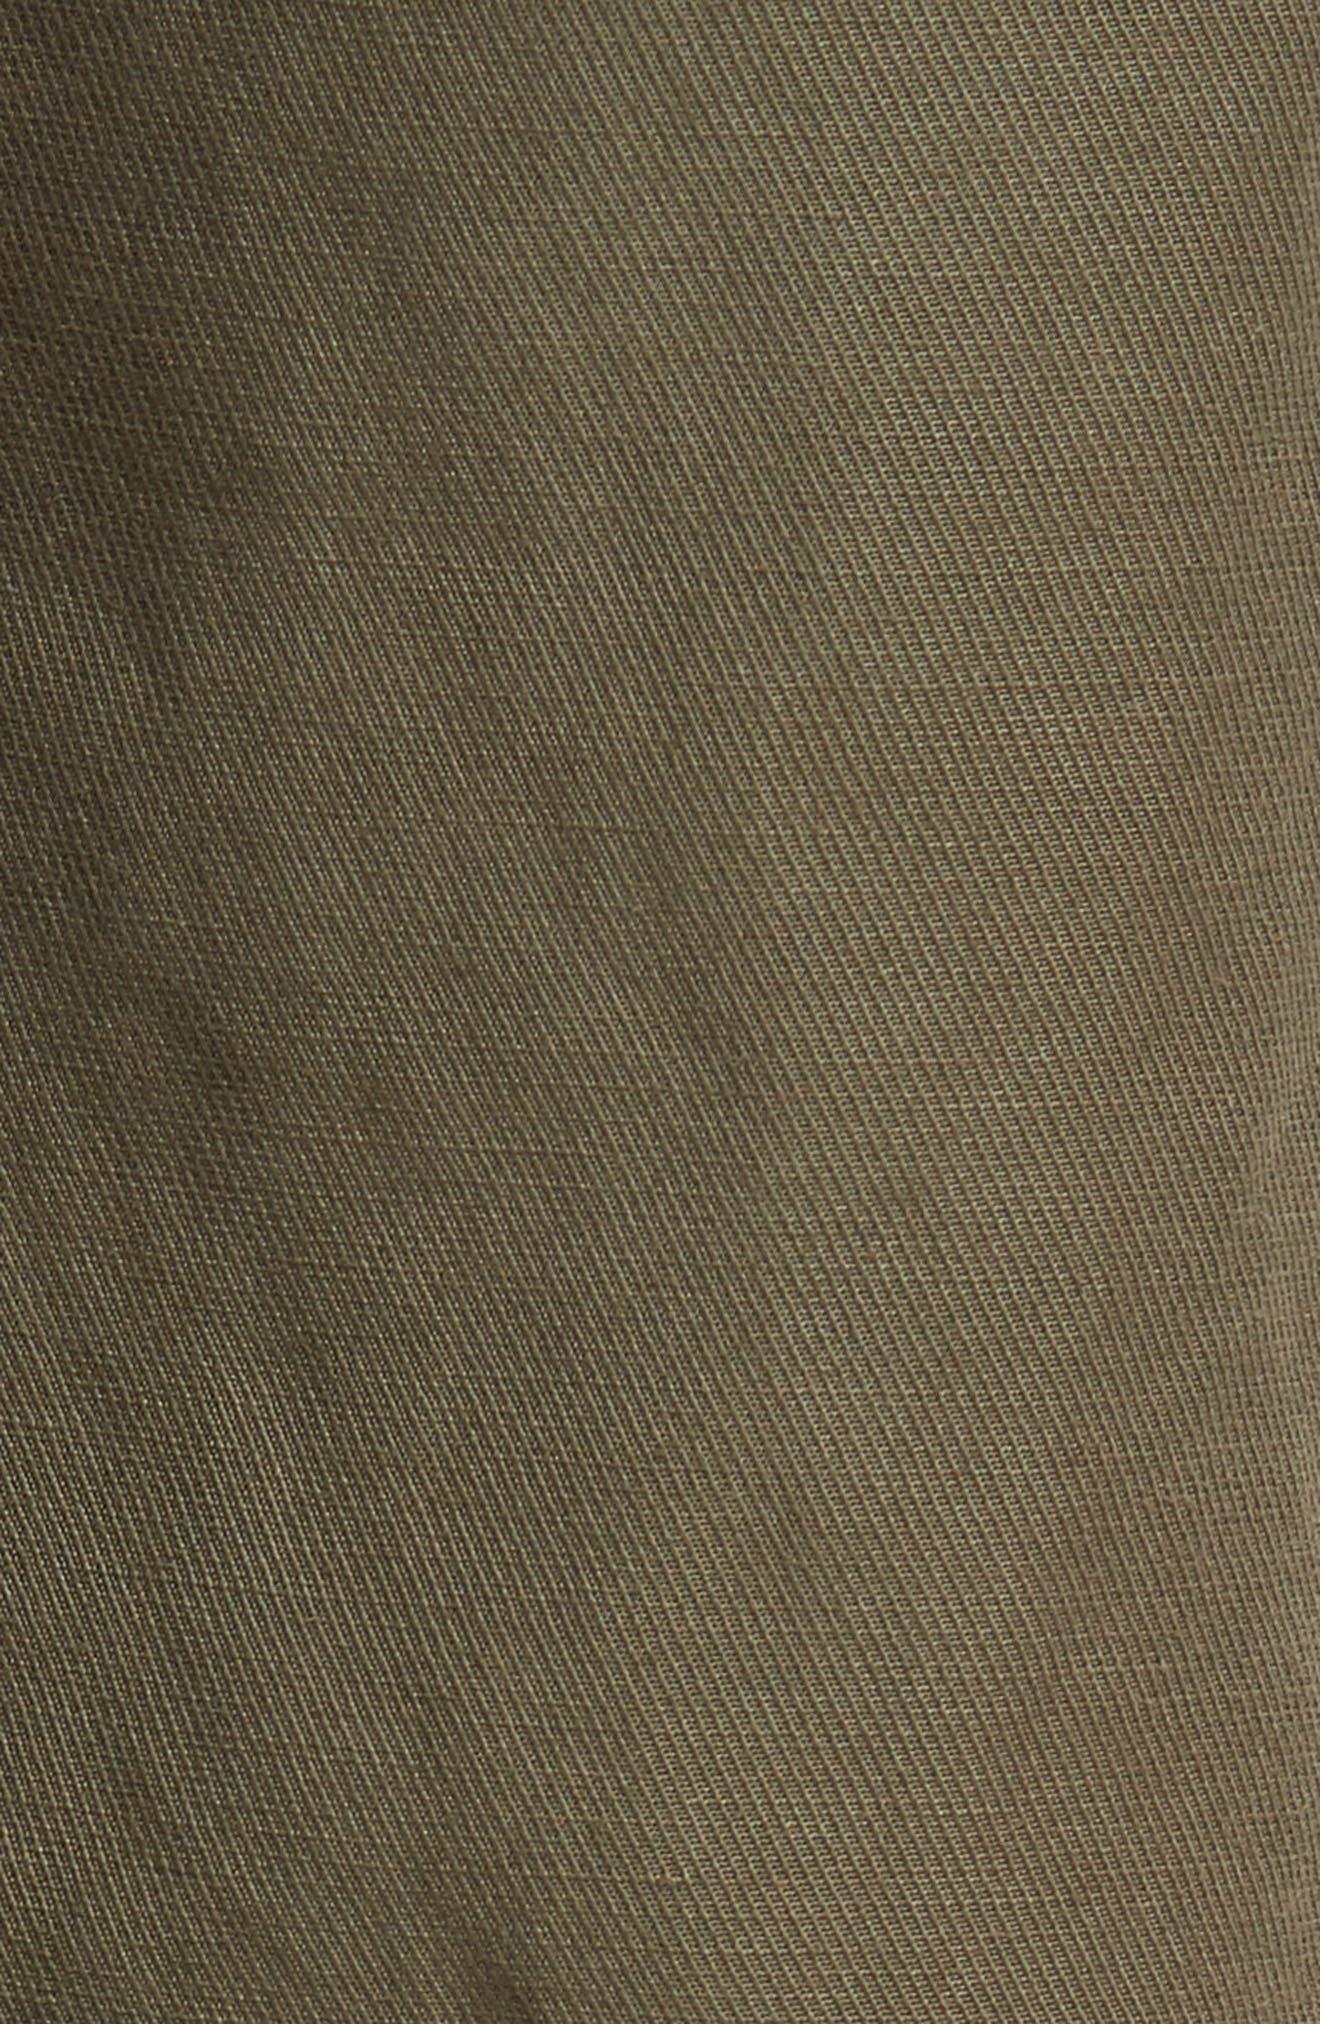 Stellina High Waist Pants,                             Alternate thumbnail 6, color,                             Verdant